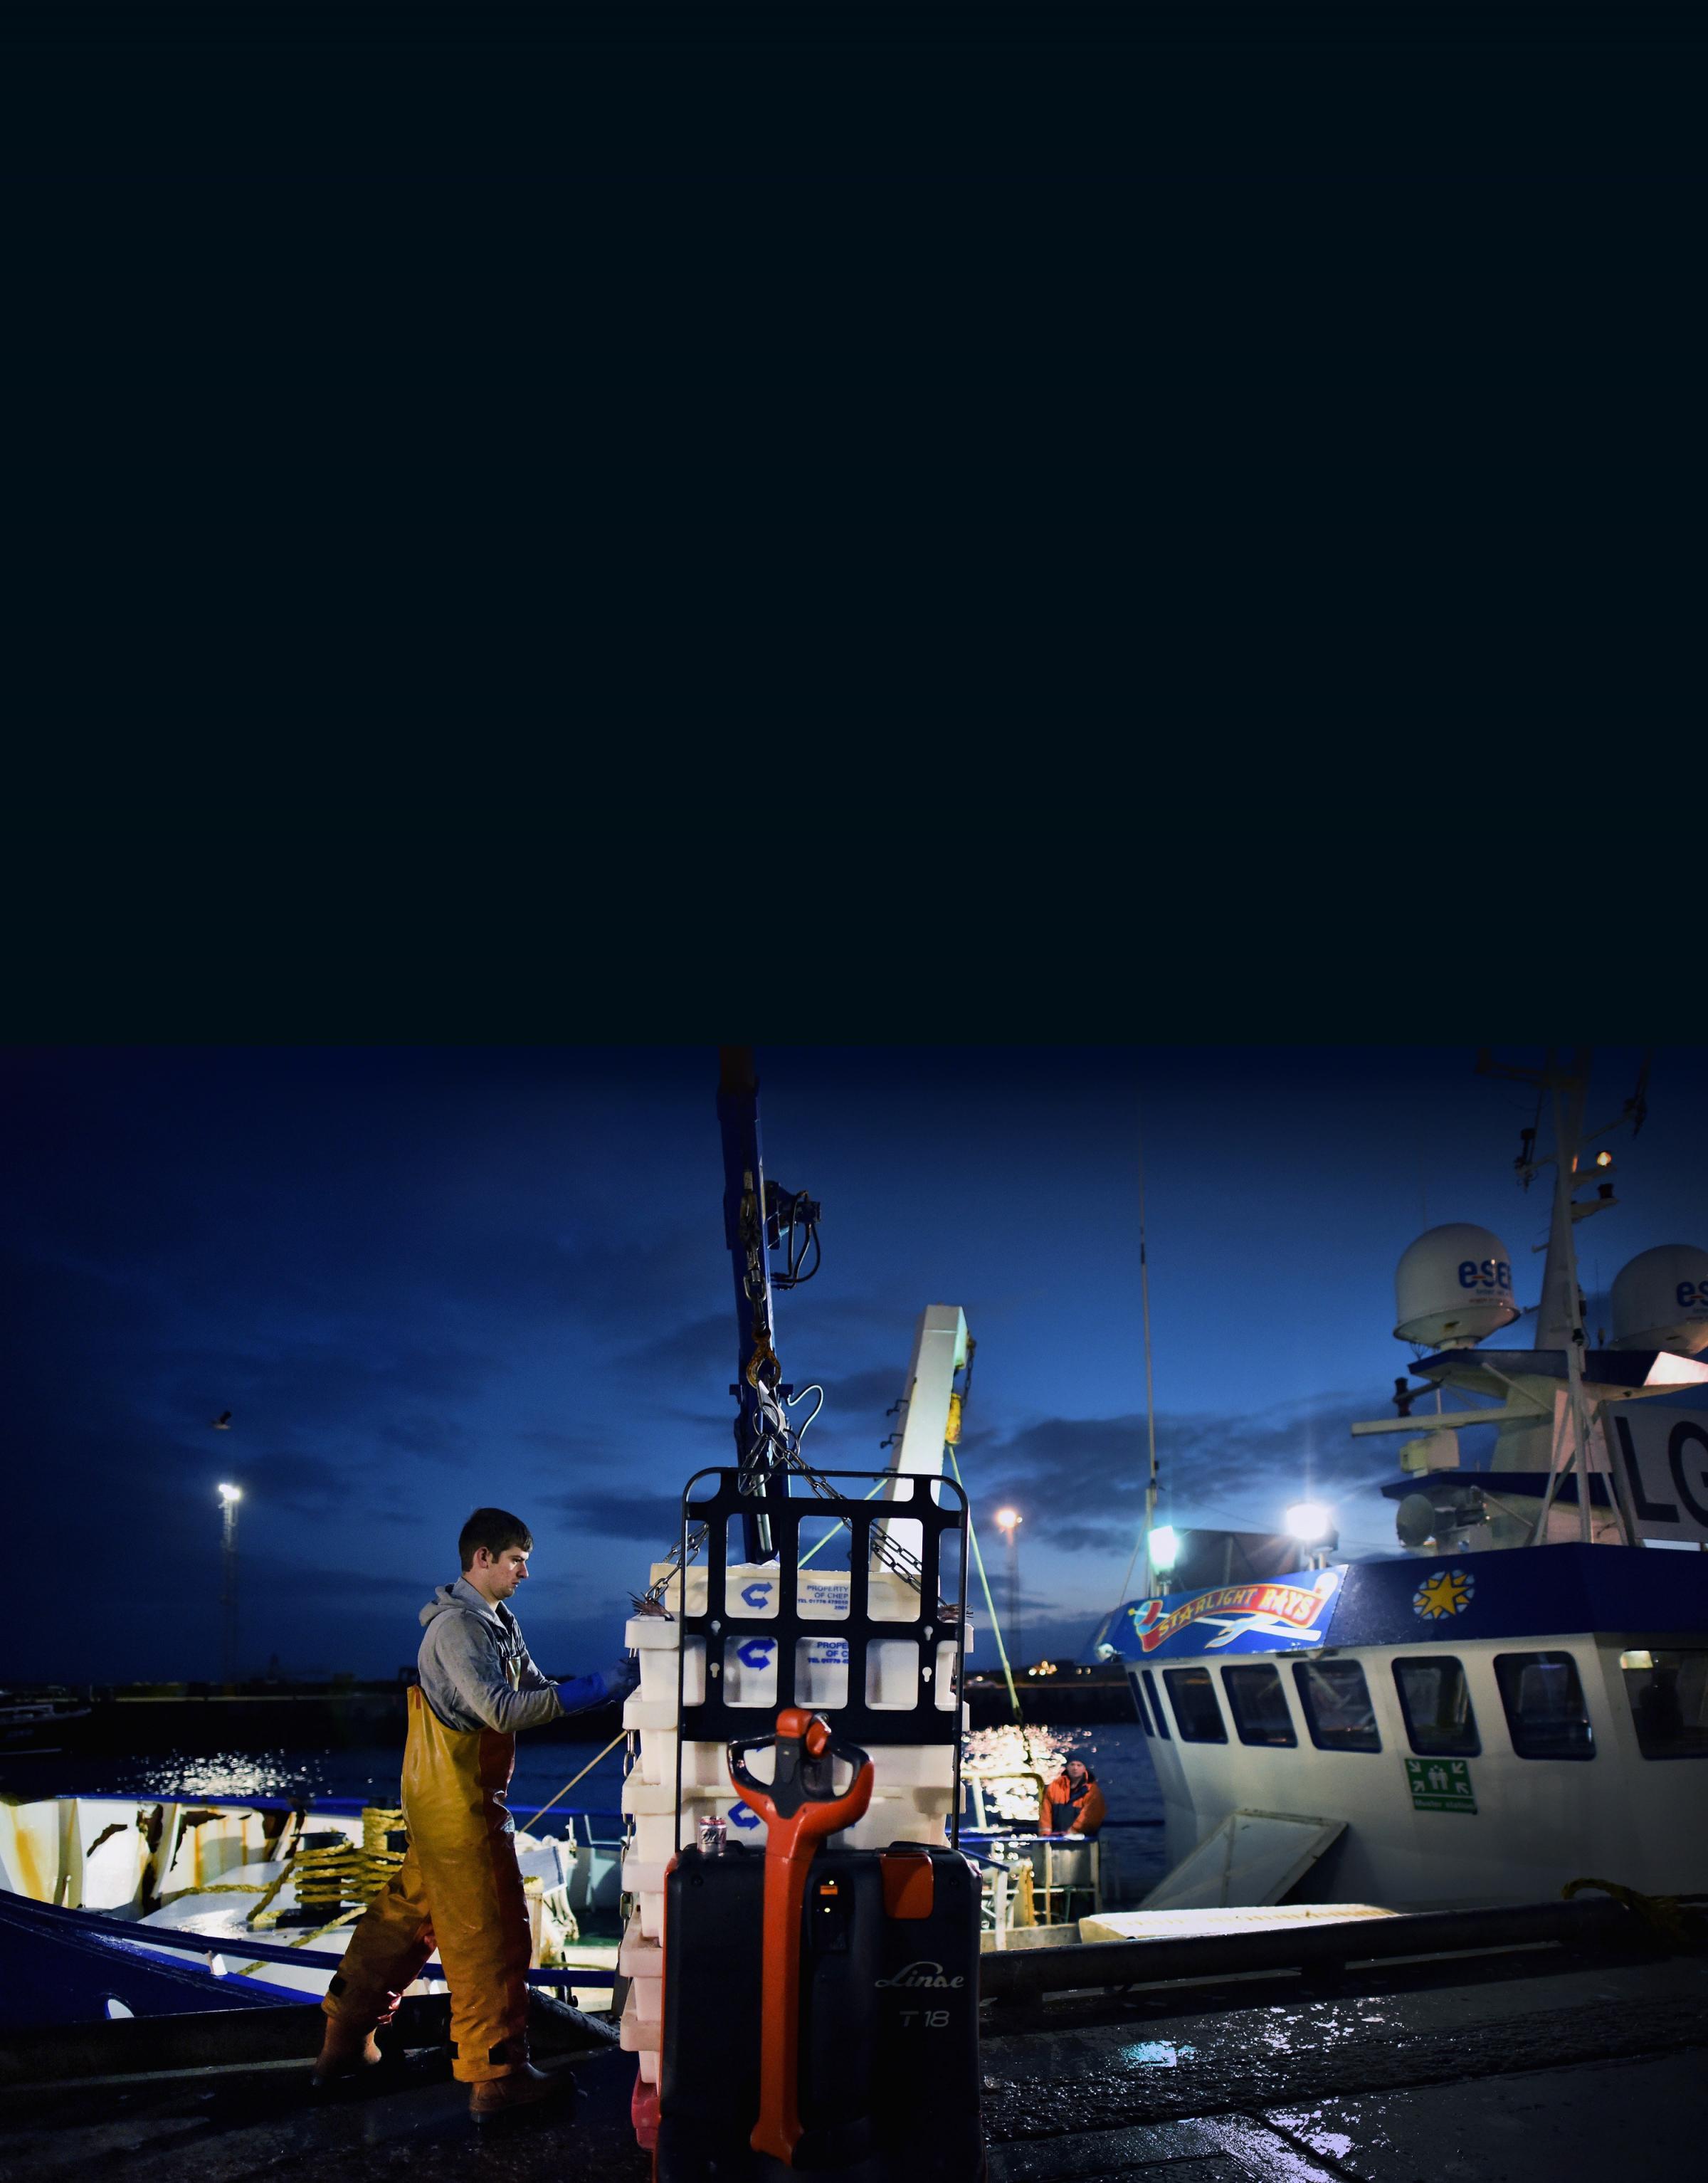 SNP ready to discuss free ports in Scotland despite crime fears